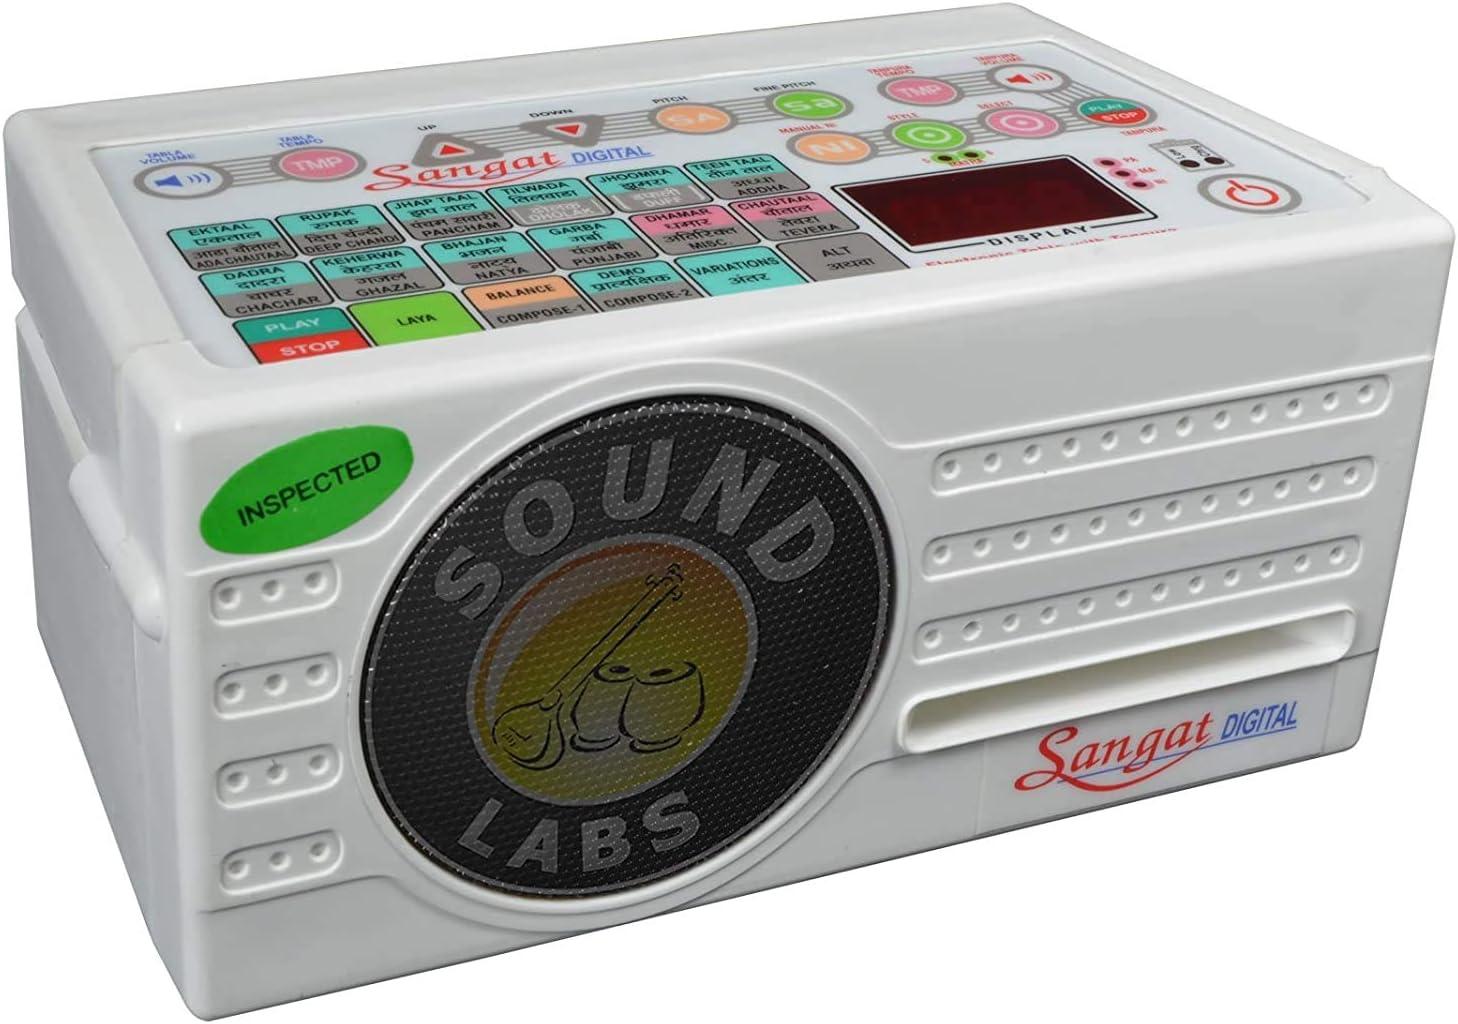 With Tabla 5 in 1 Dholak /& Duff THANKSGIVING-30 Digital Electronic Tanpura PDI-DBF Bag,Tambura